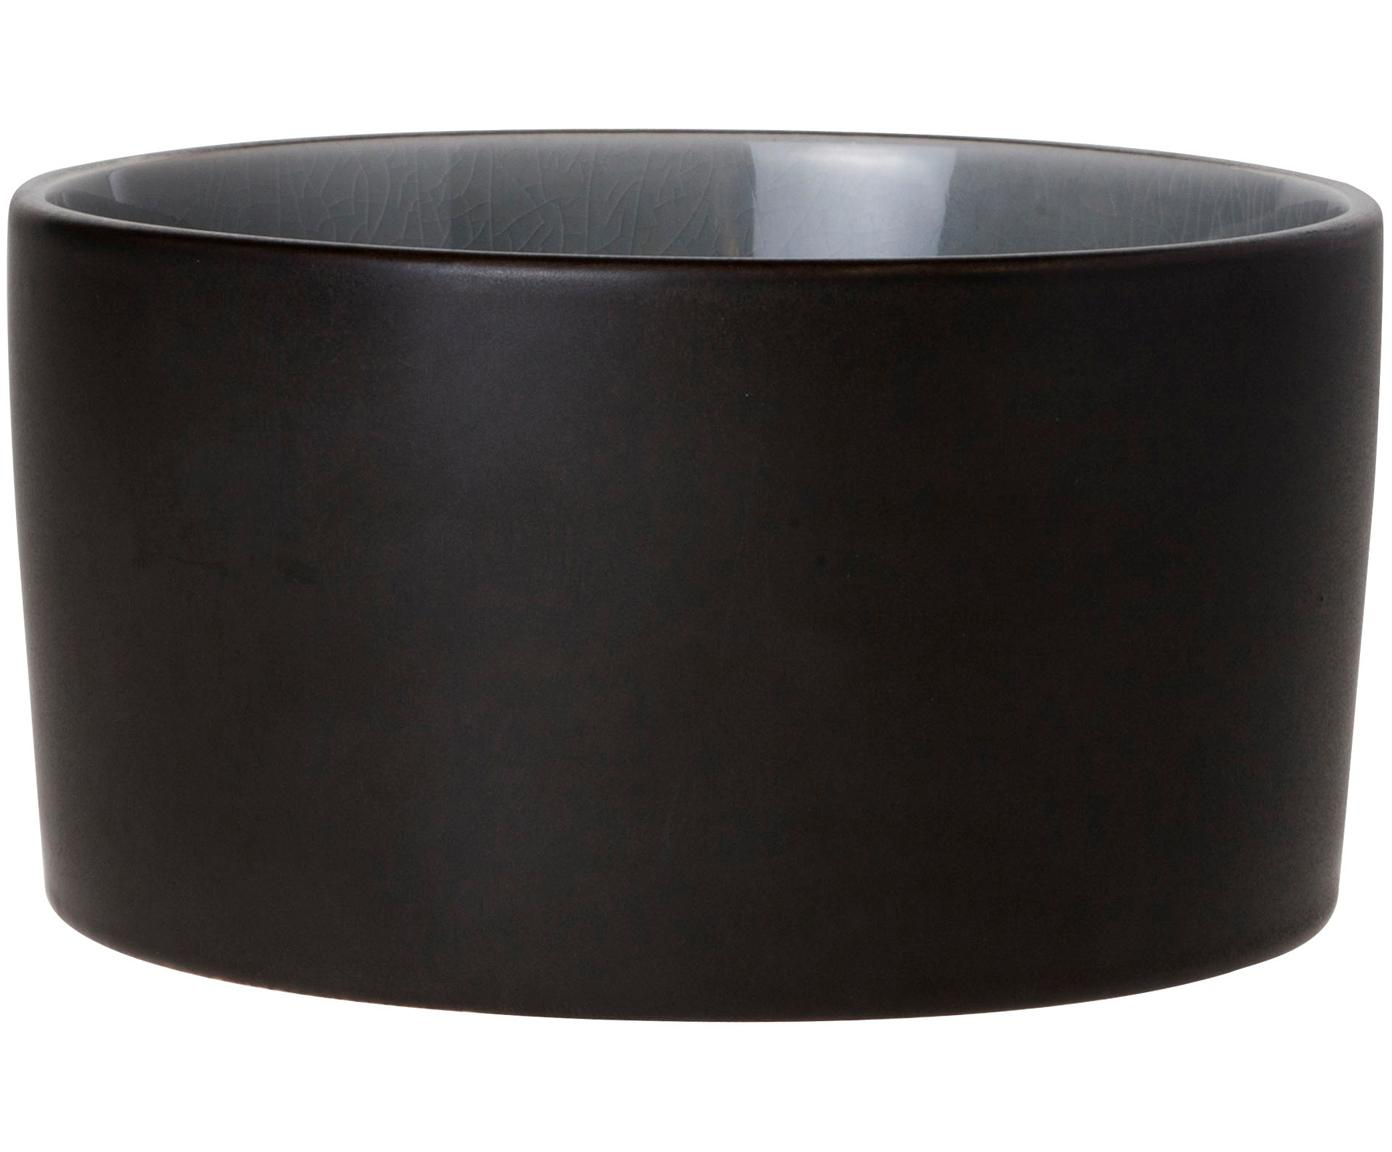 Schälchen Lagune Black, 2 Stück, Keramik, Graubraun, Hellgrau, Ø 12 x H 6 cm